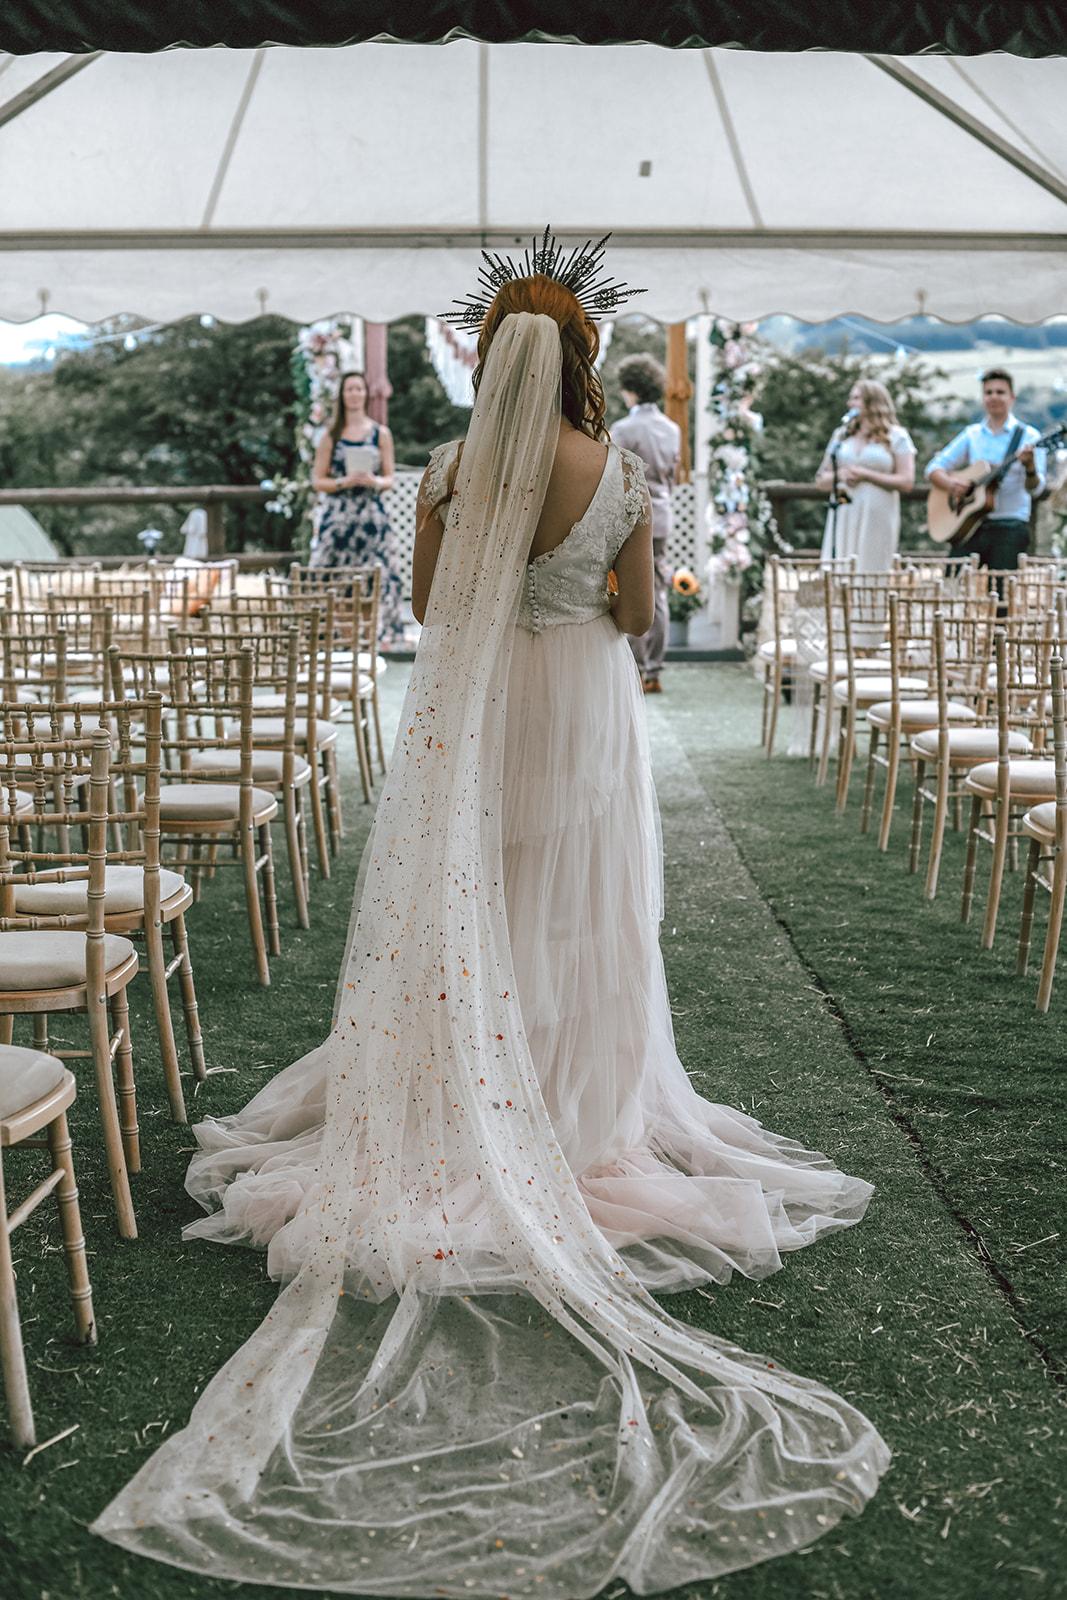 rustic festival wedding - hand painted veil - unique wedding veil - outdoor wedding ceremony